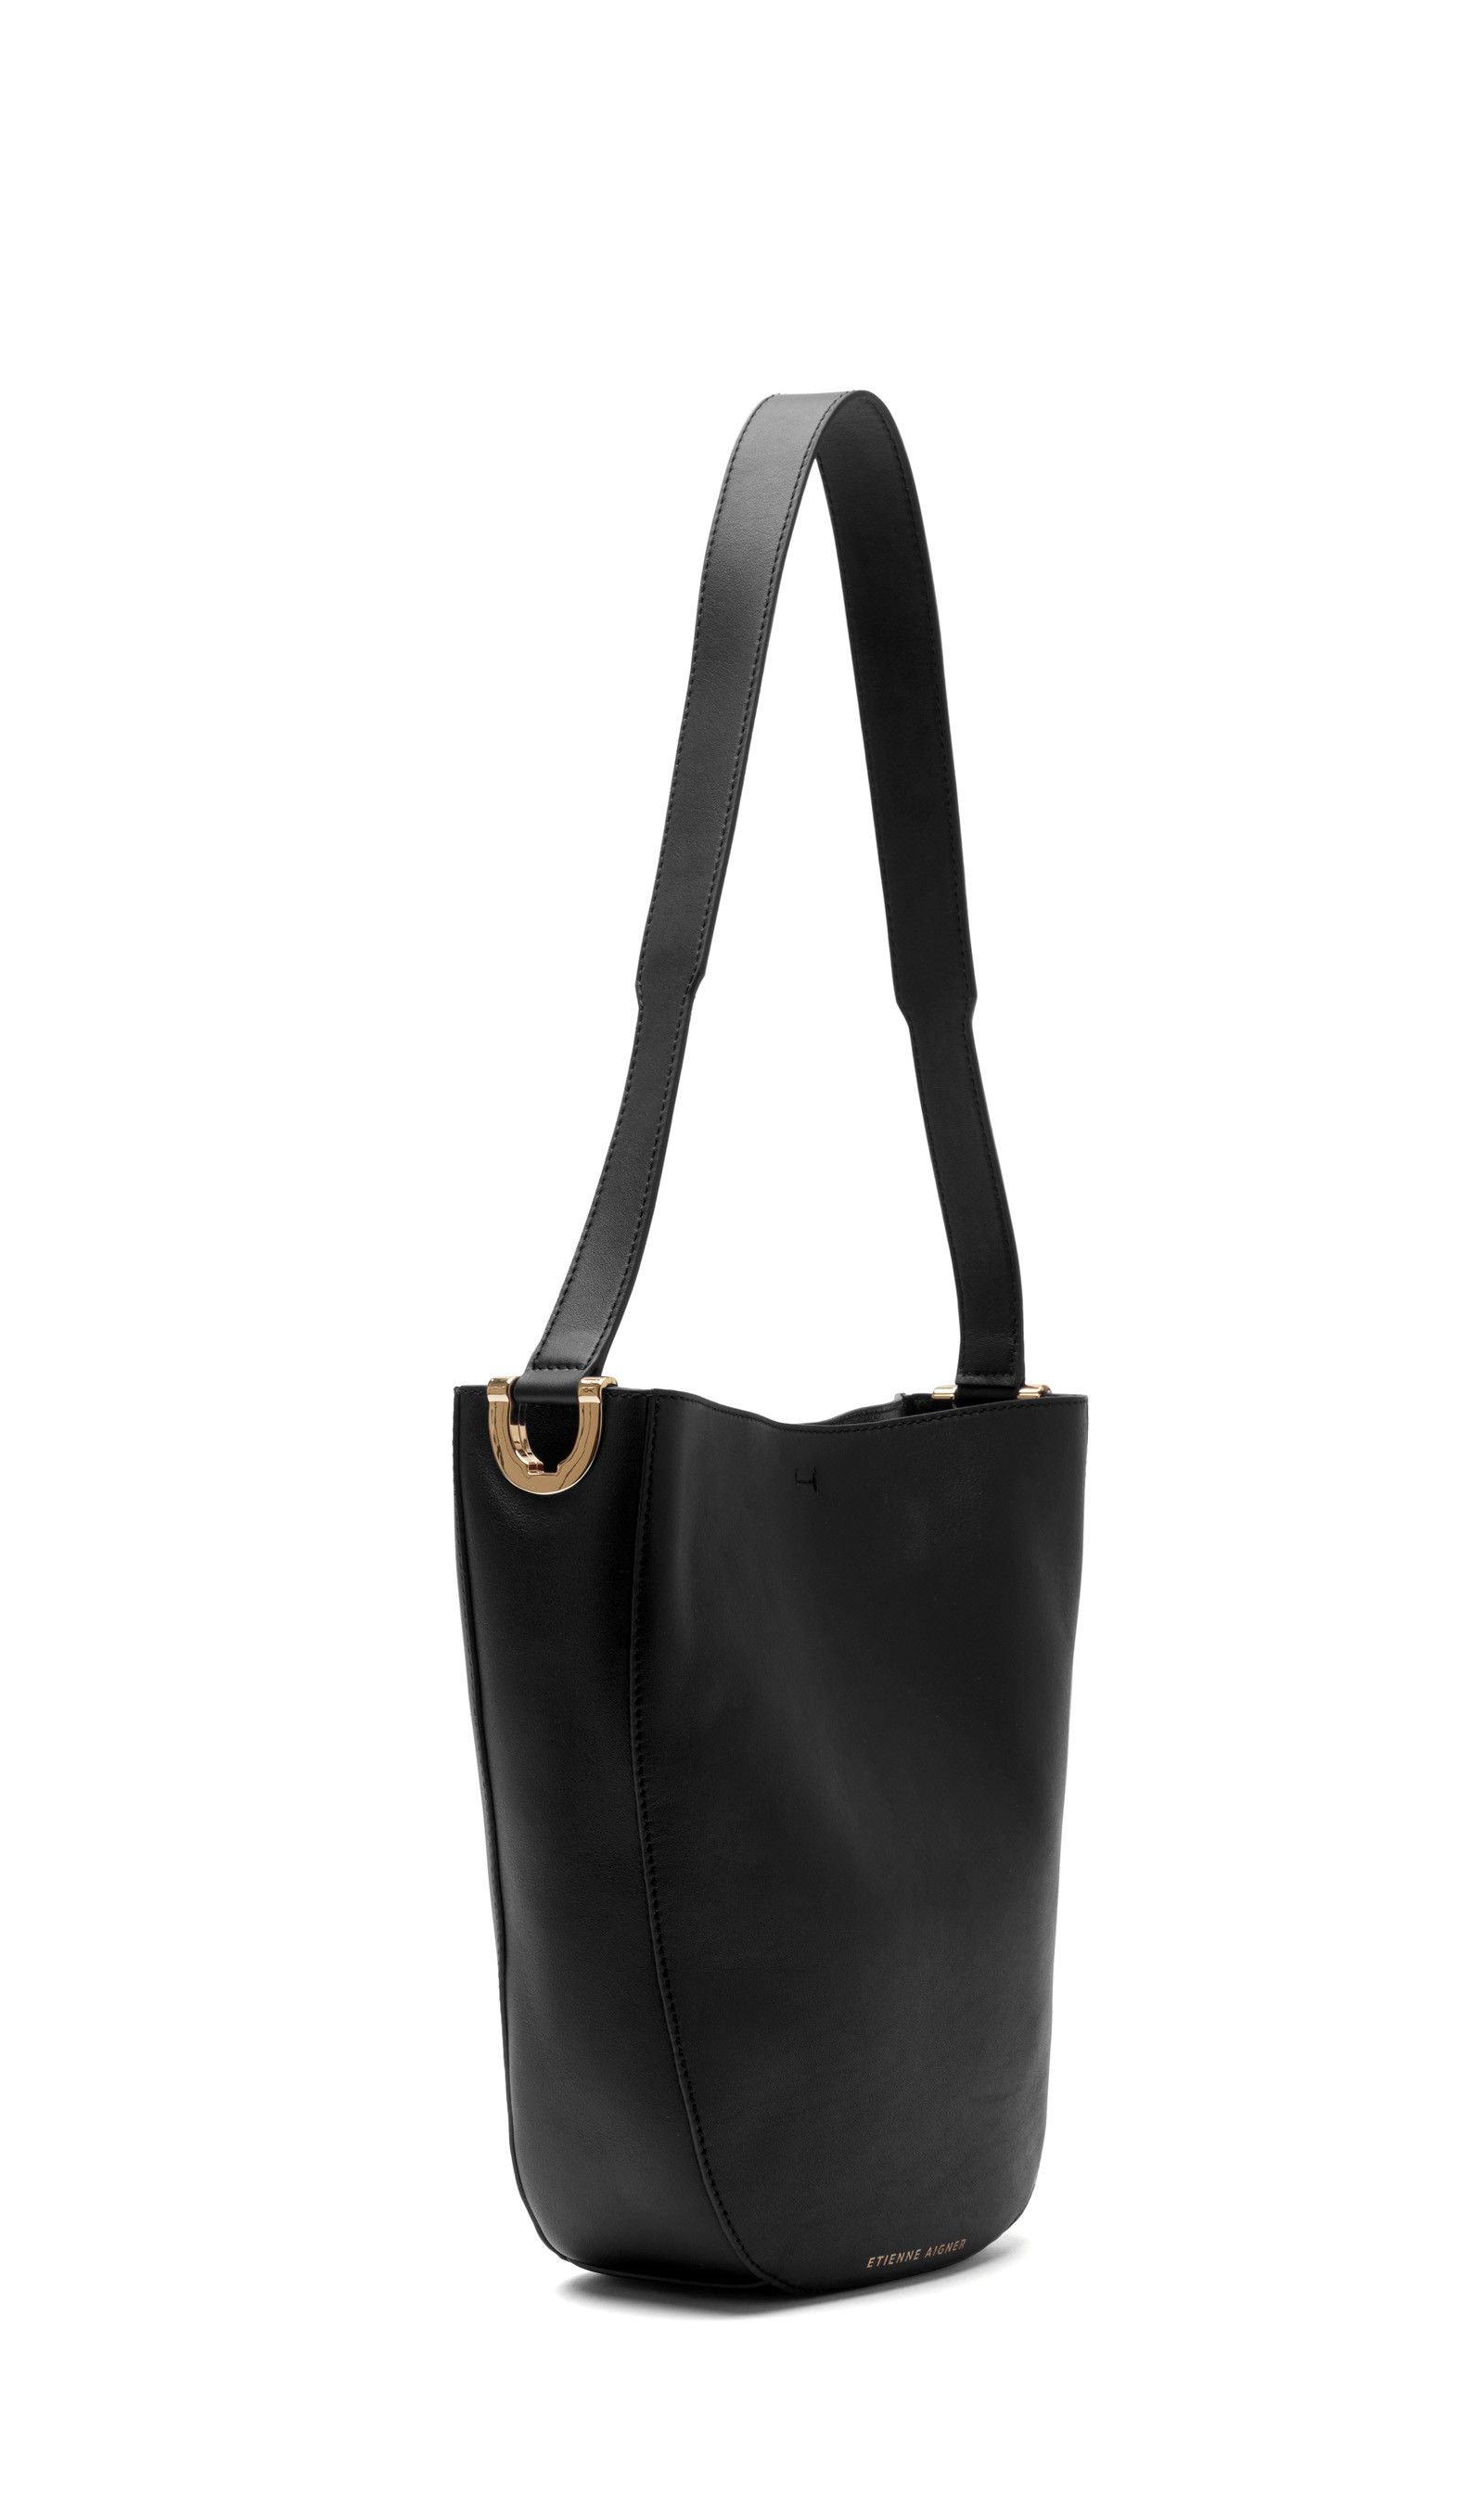 Mara Mini Hobo Bag 295USD | Handbags | Pinterest | Minis, Bags and ...